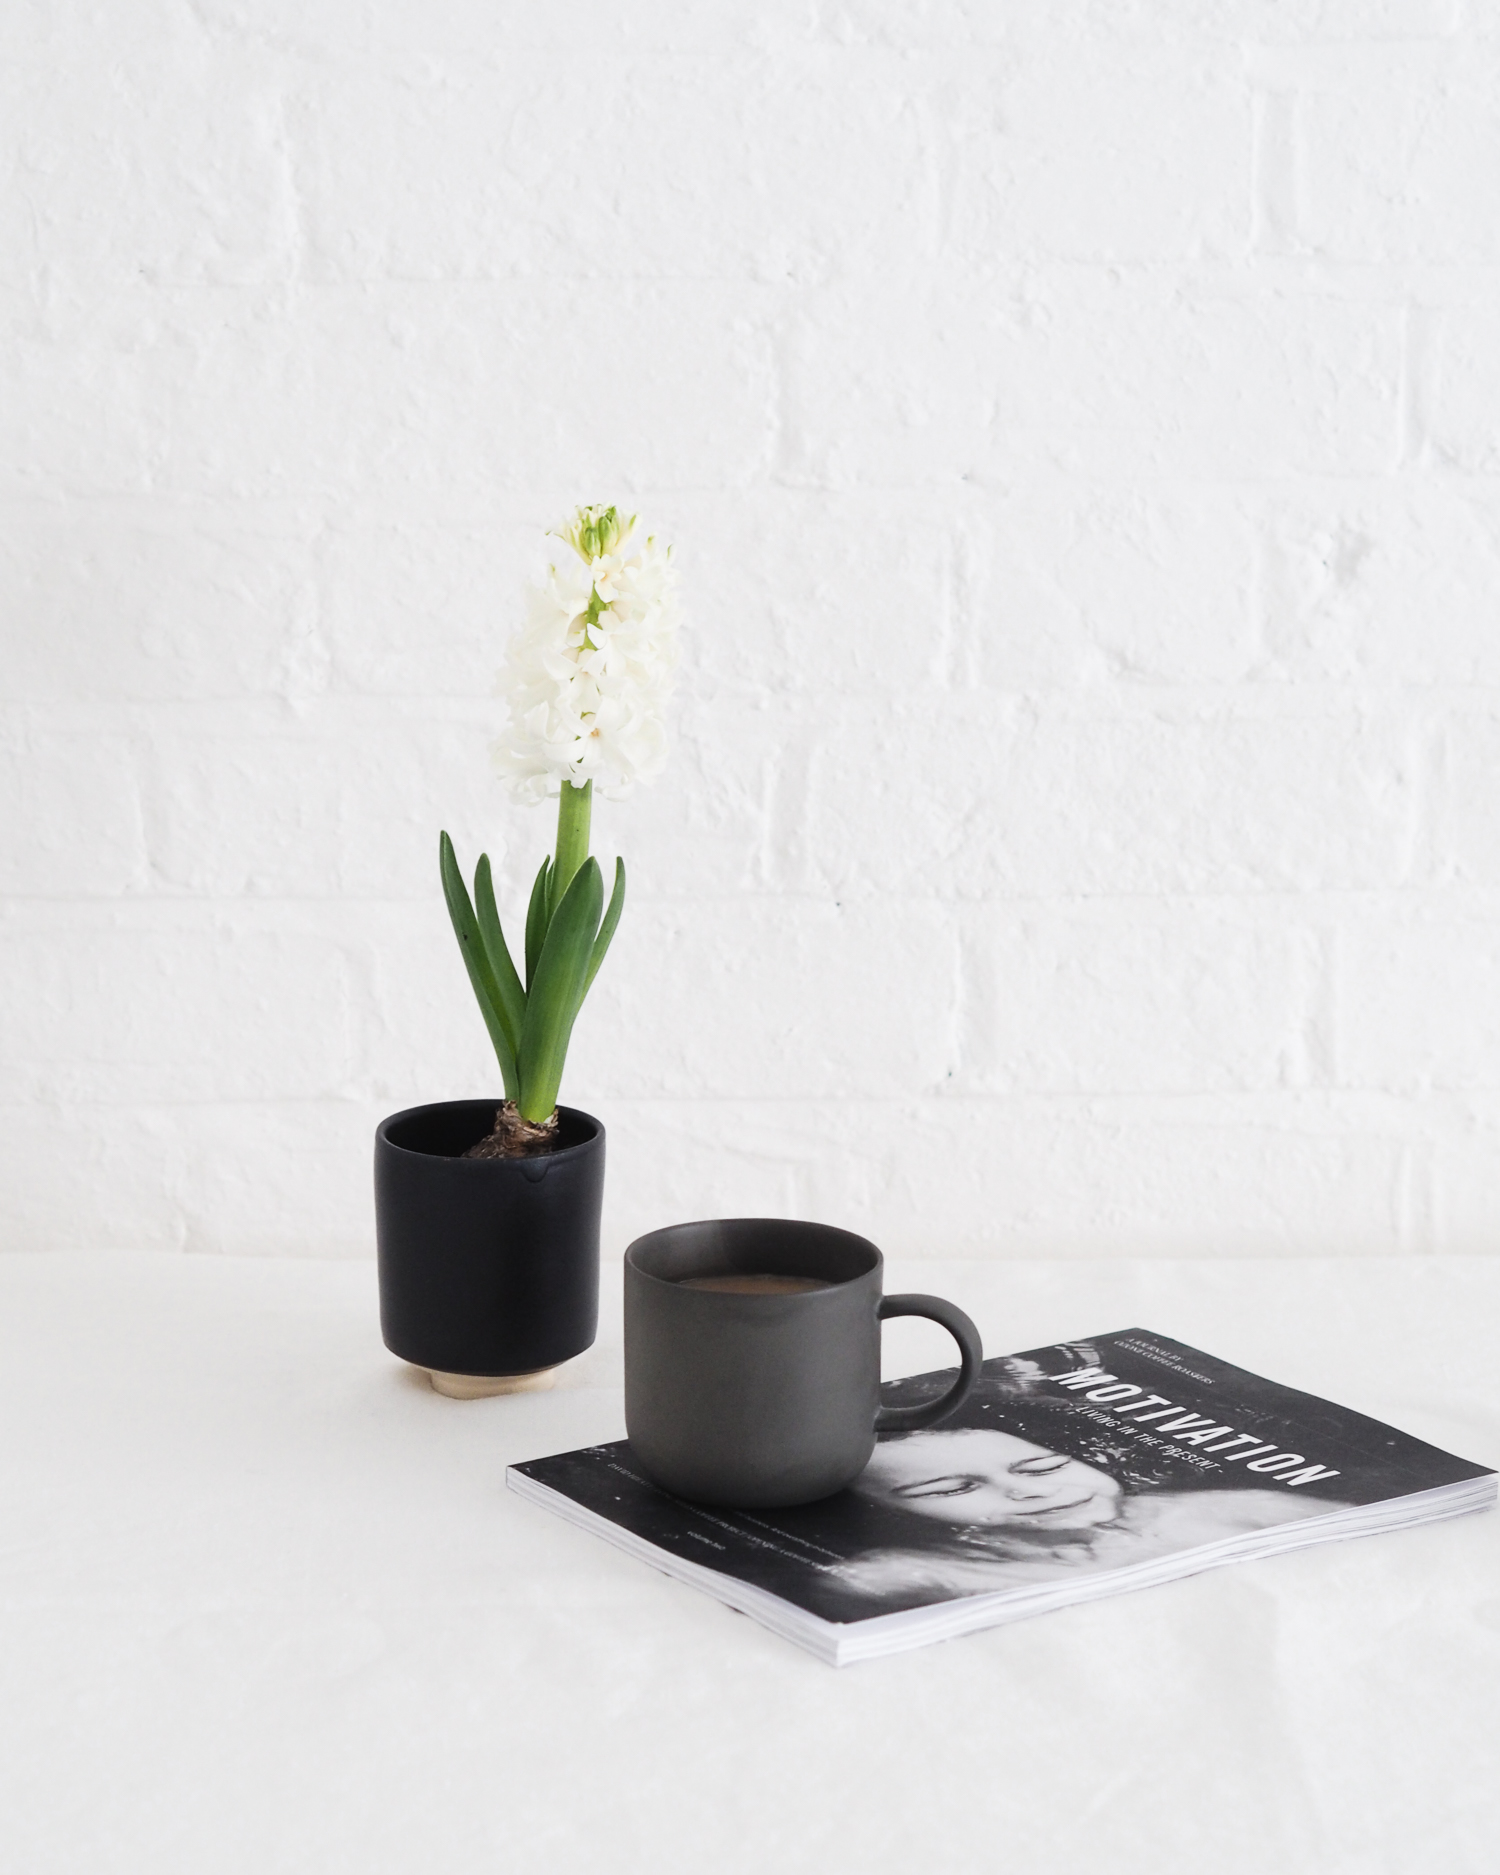 Tea and hyacinth | Design Hunter